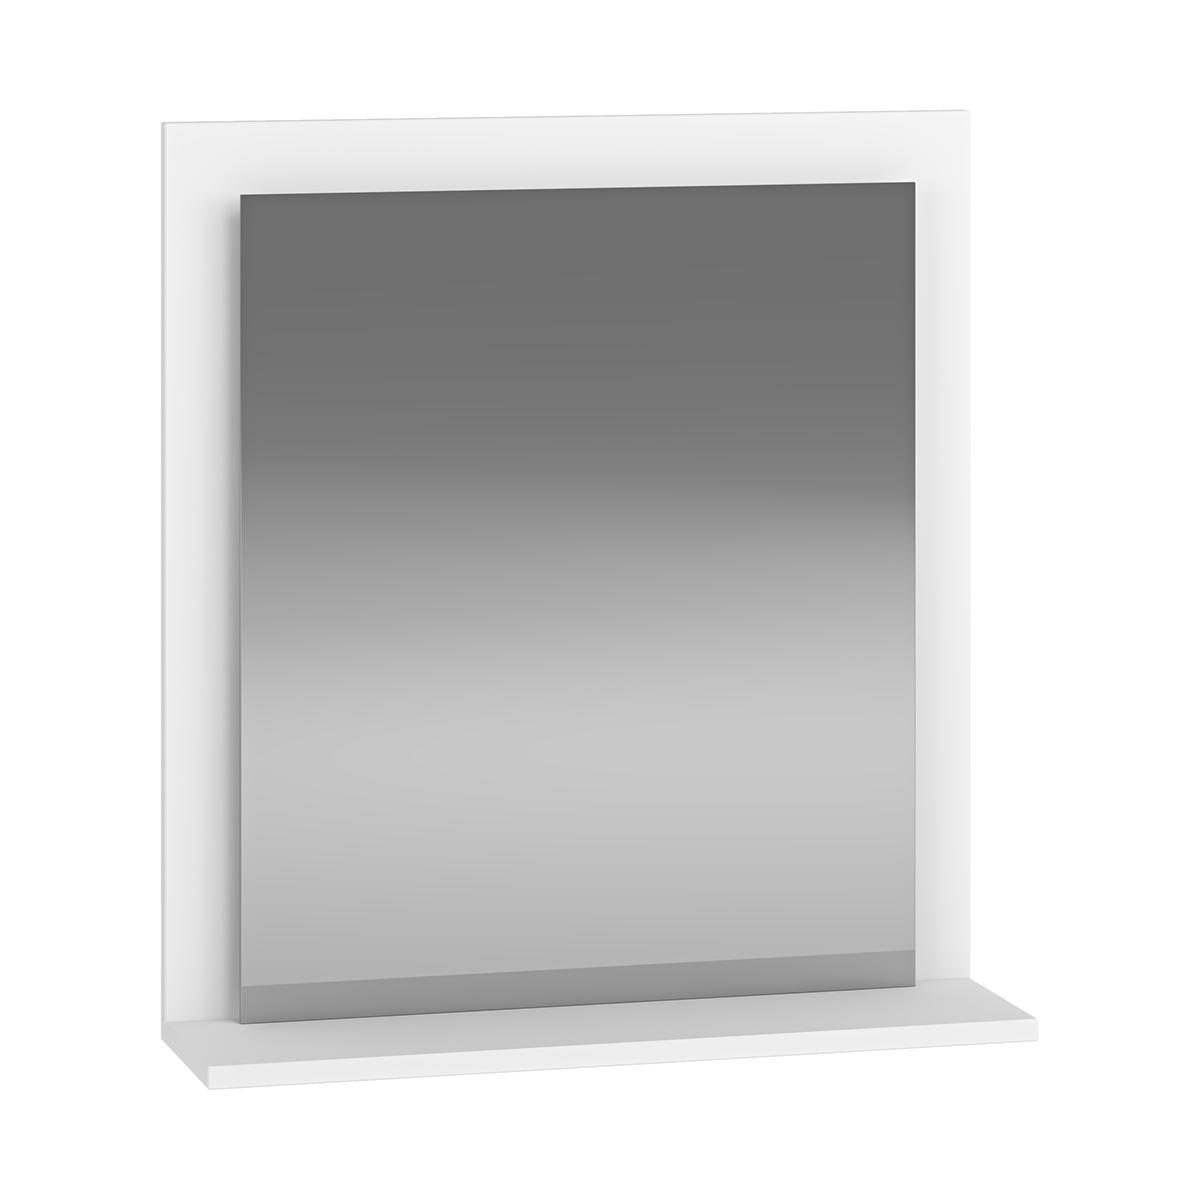 NABBI Baleta Z60 zrkadlo na stenu alaska